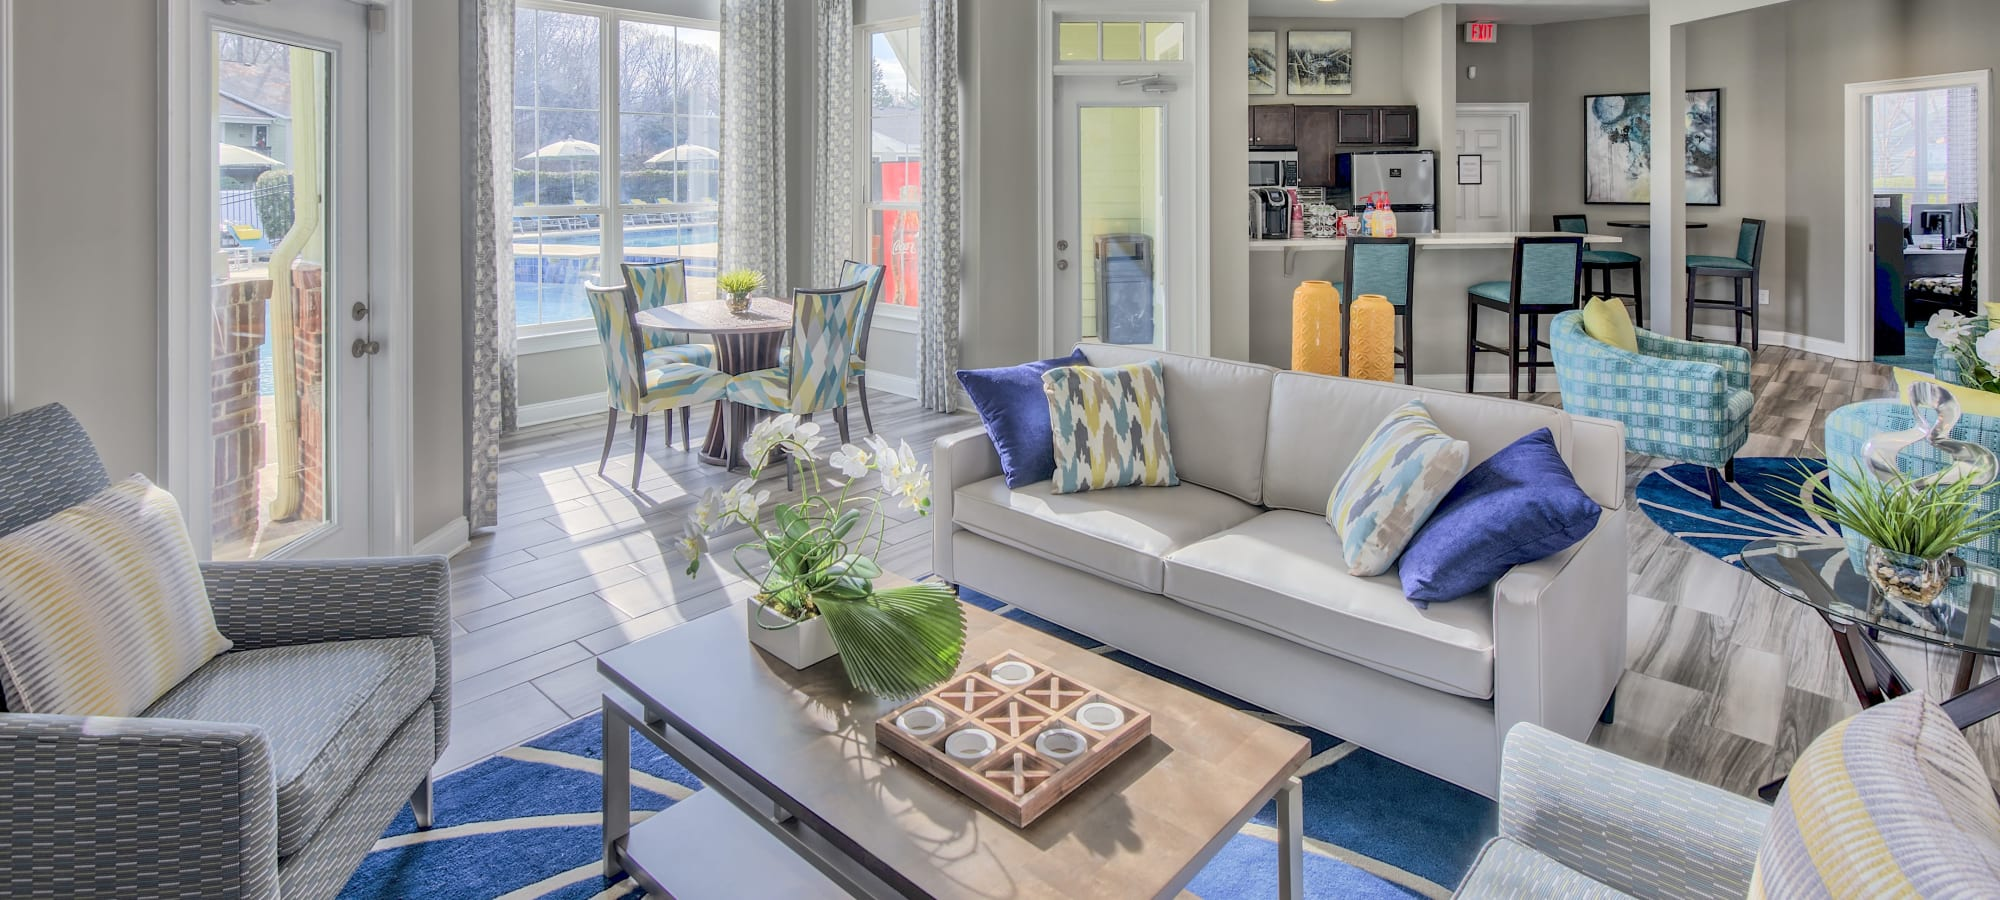 Apartments at The Madison in Charlotte, North Carolina